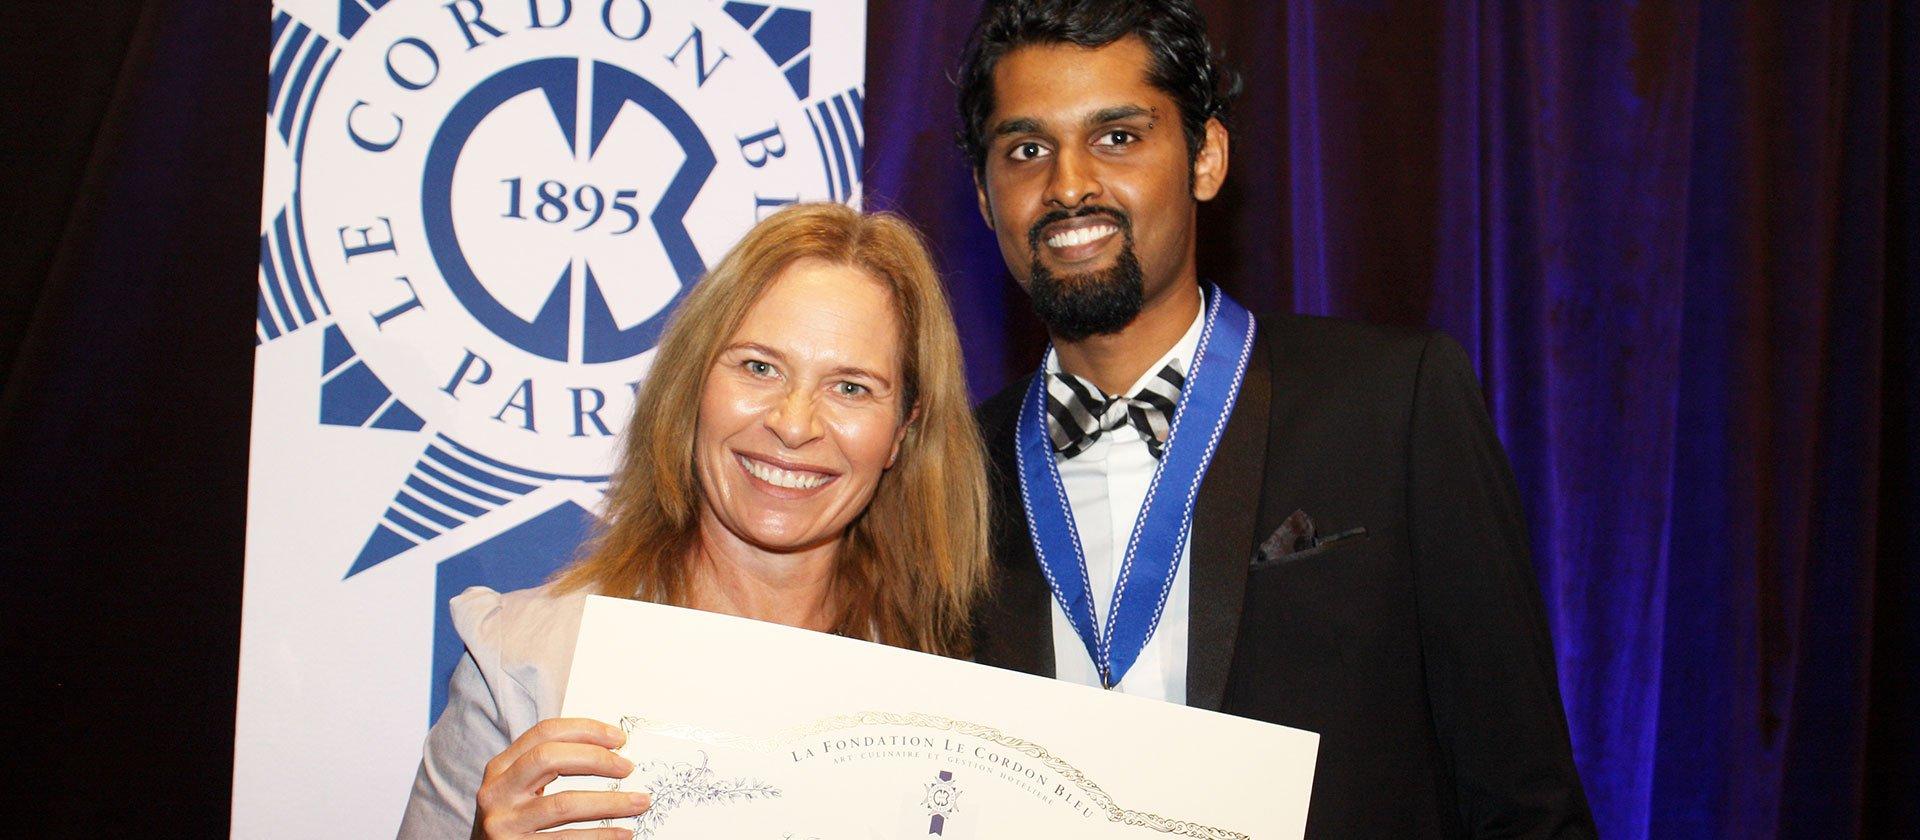 LCB Sydney Student Response: Nicolas Jonathan Machado